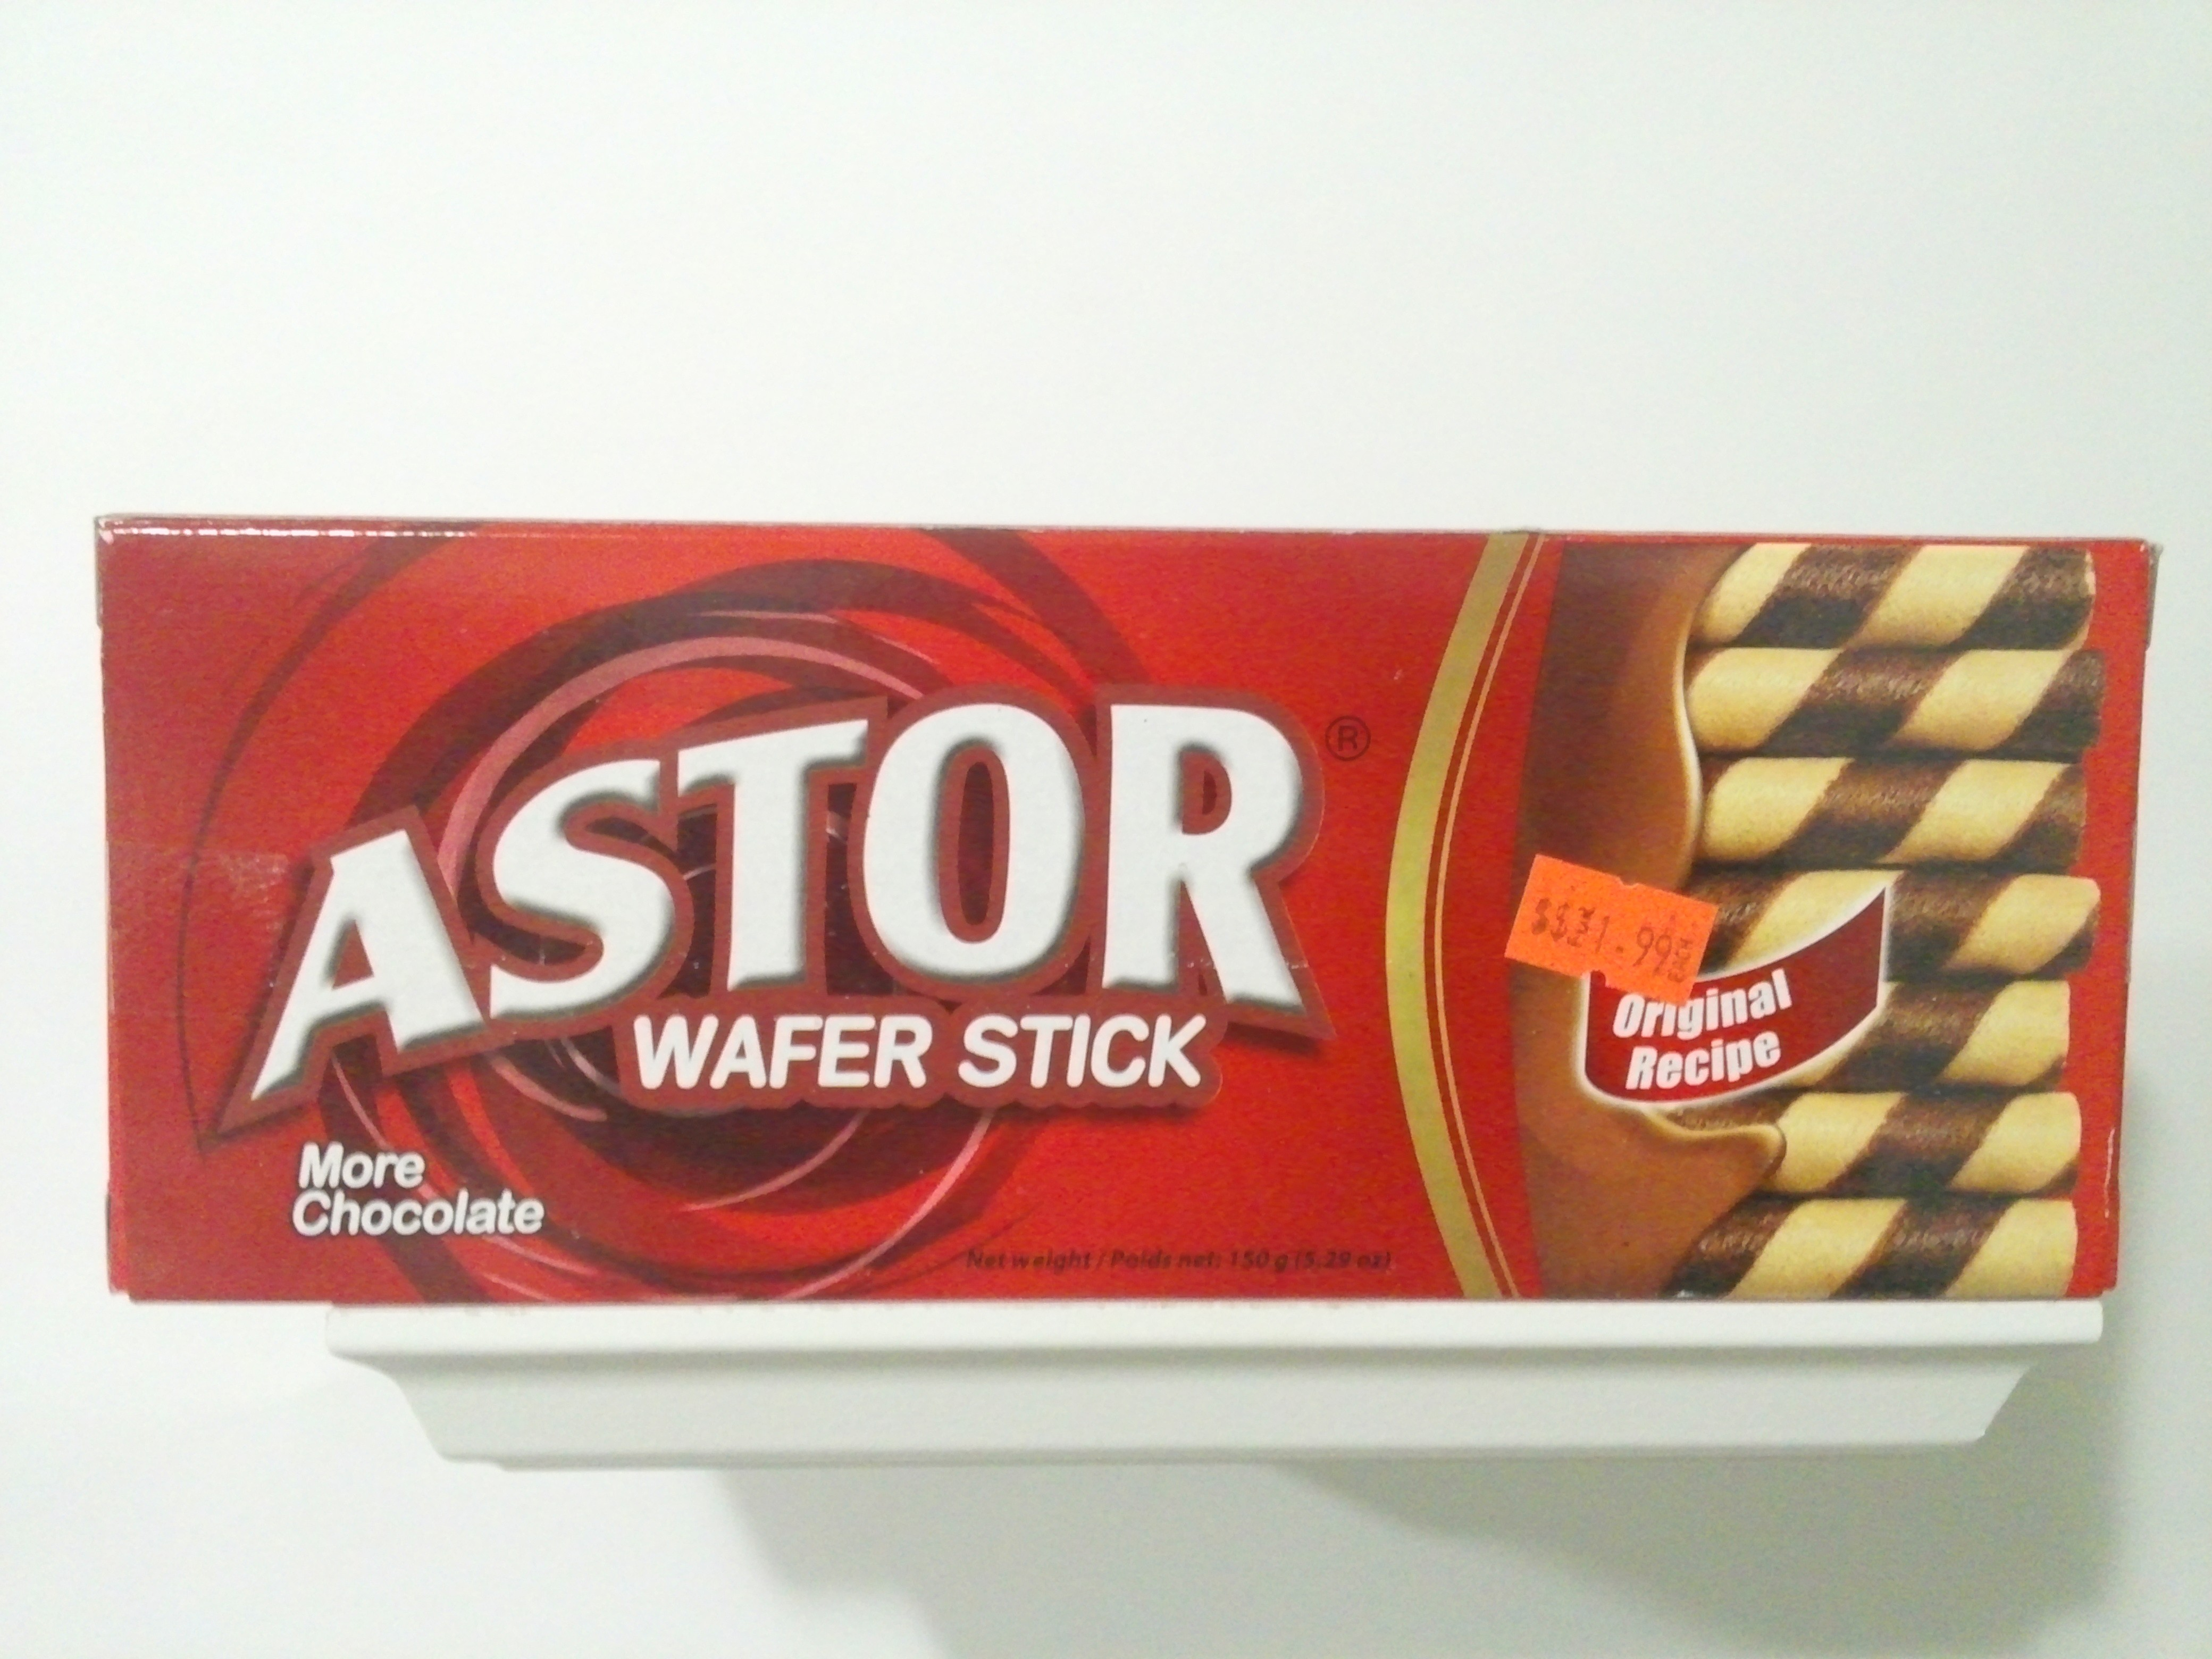 Astor Wafer Stick 5.29 oz